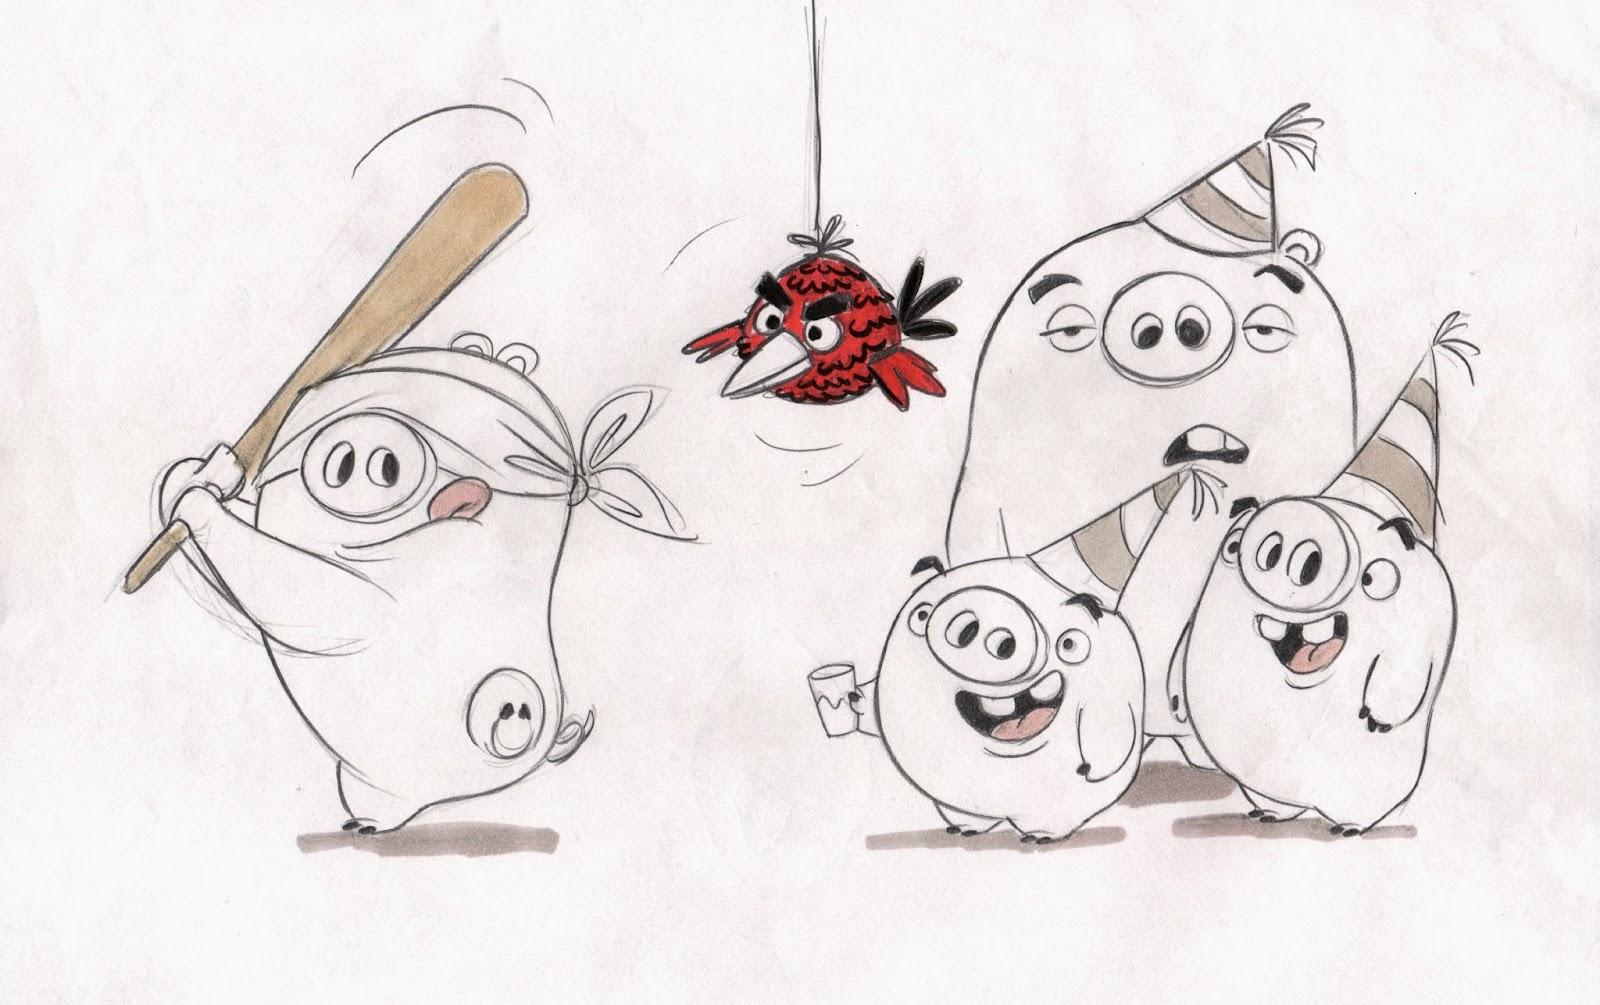 Desenhos De Sandro Cleuzo Para O Filme Angry Birds: Inspector Cleuzo: My Angry Birds Designs